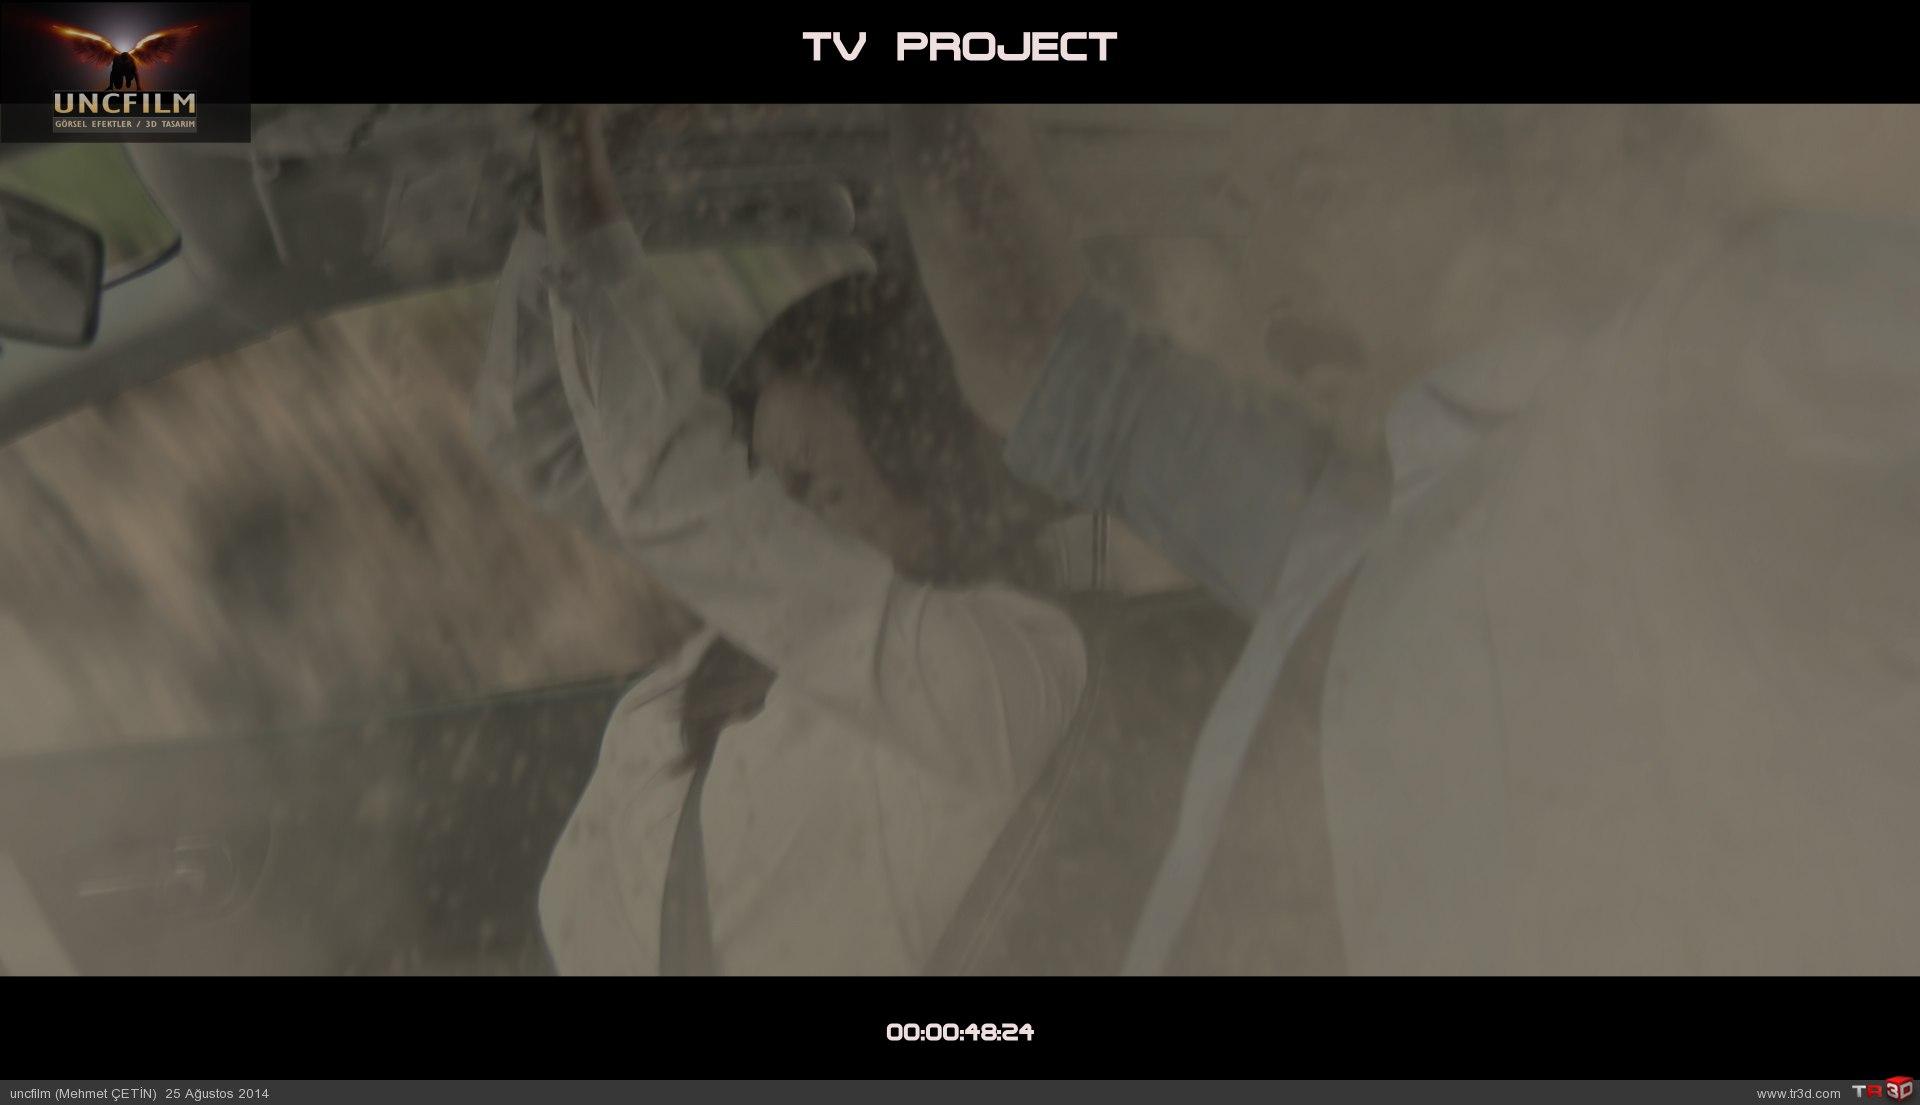 Tv produksiyon, kaza sahnesi 2